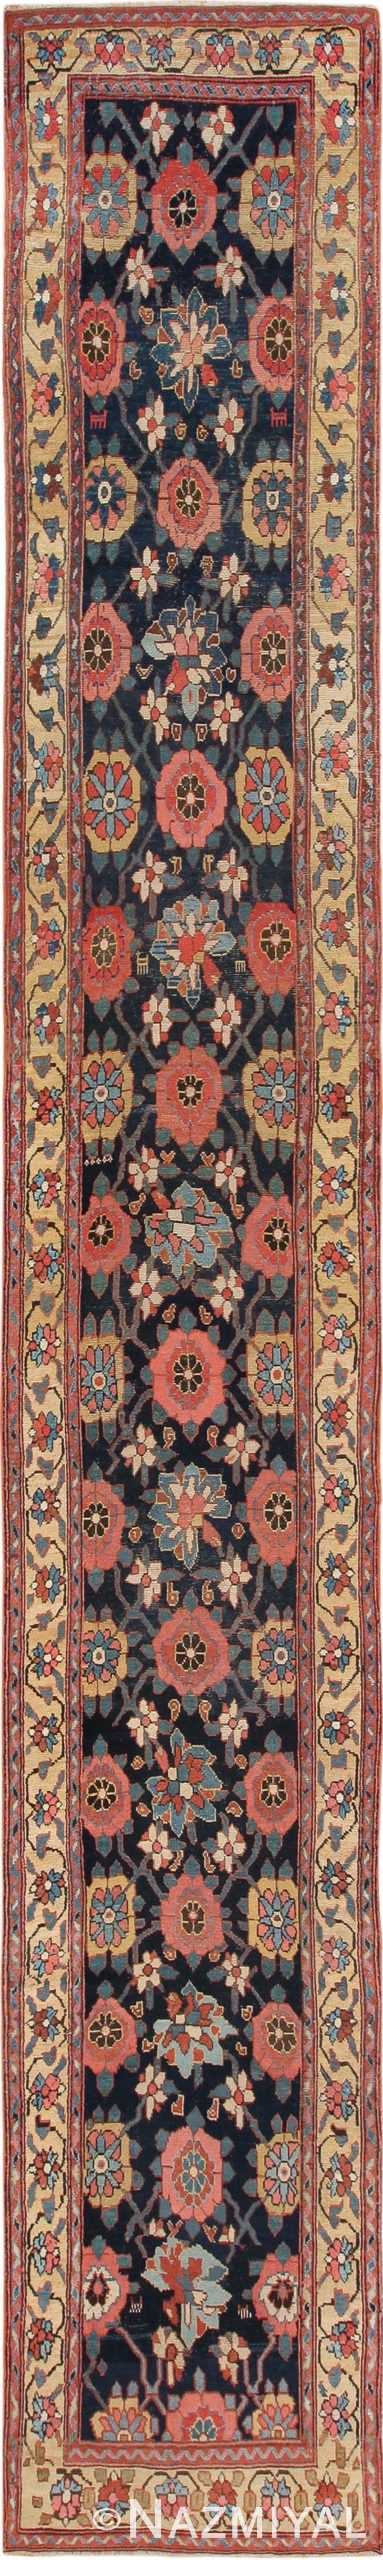 Early 19th Century Tribal Northwest Persian Runner Rug 49499 - Nazmiyal